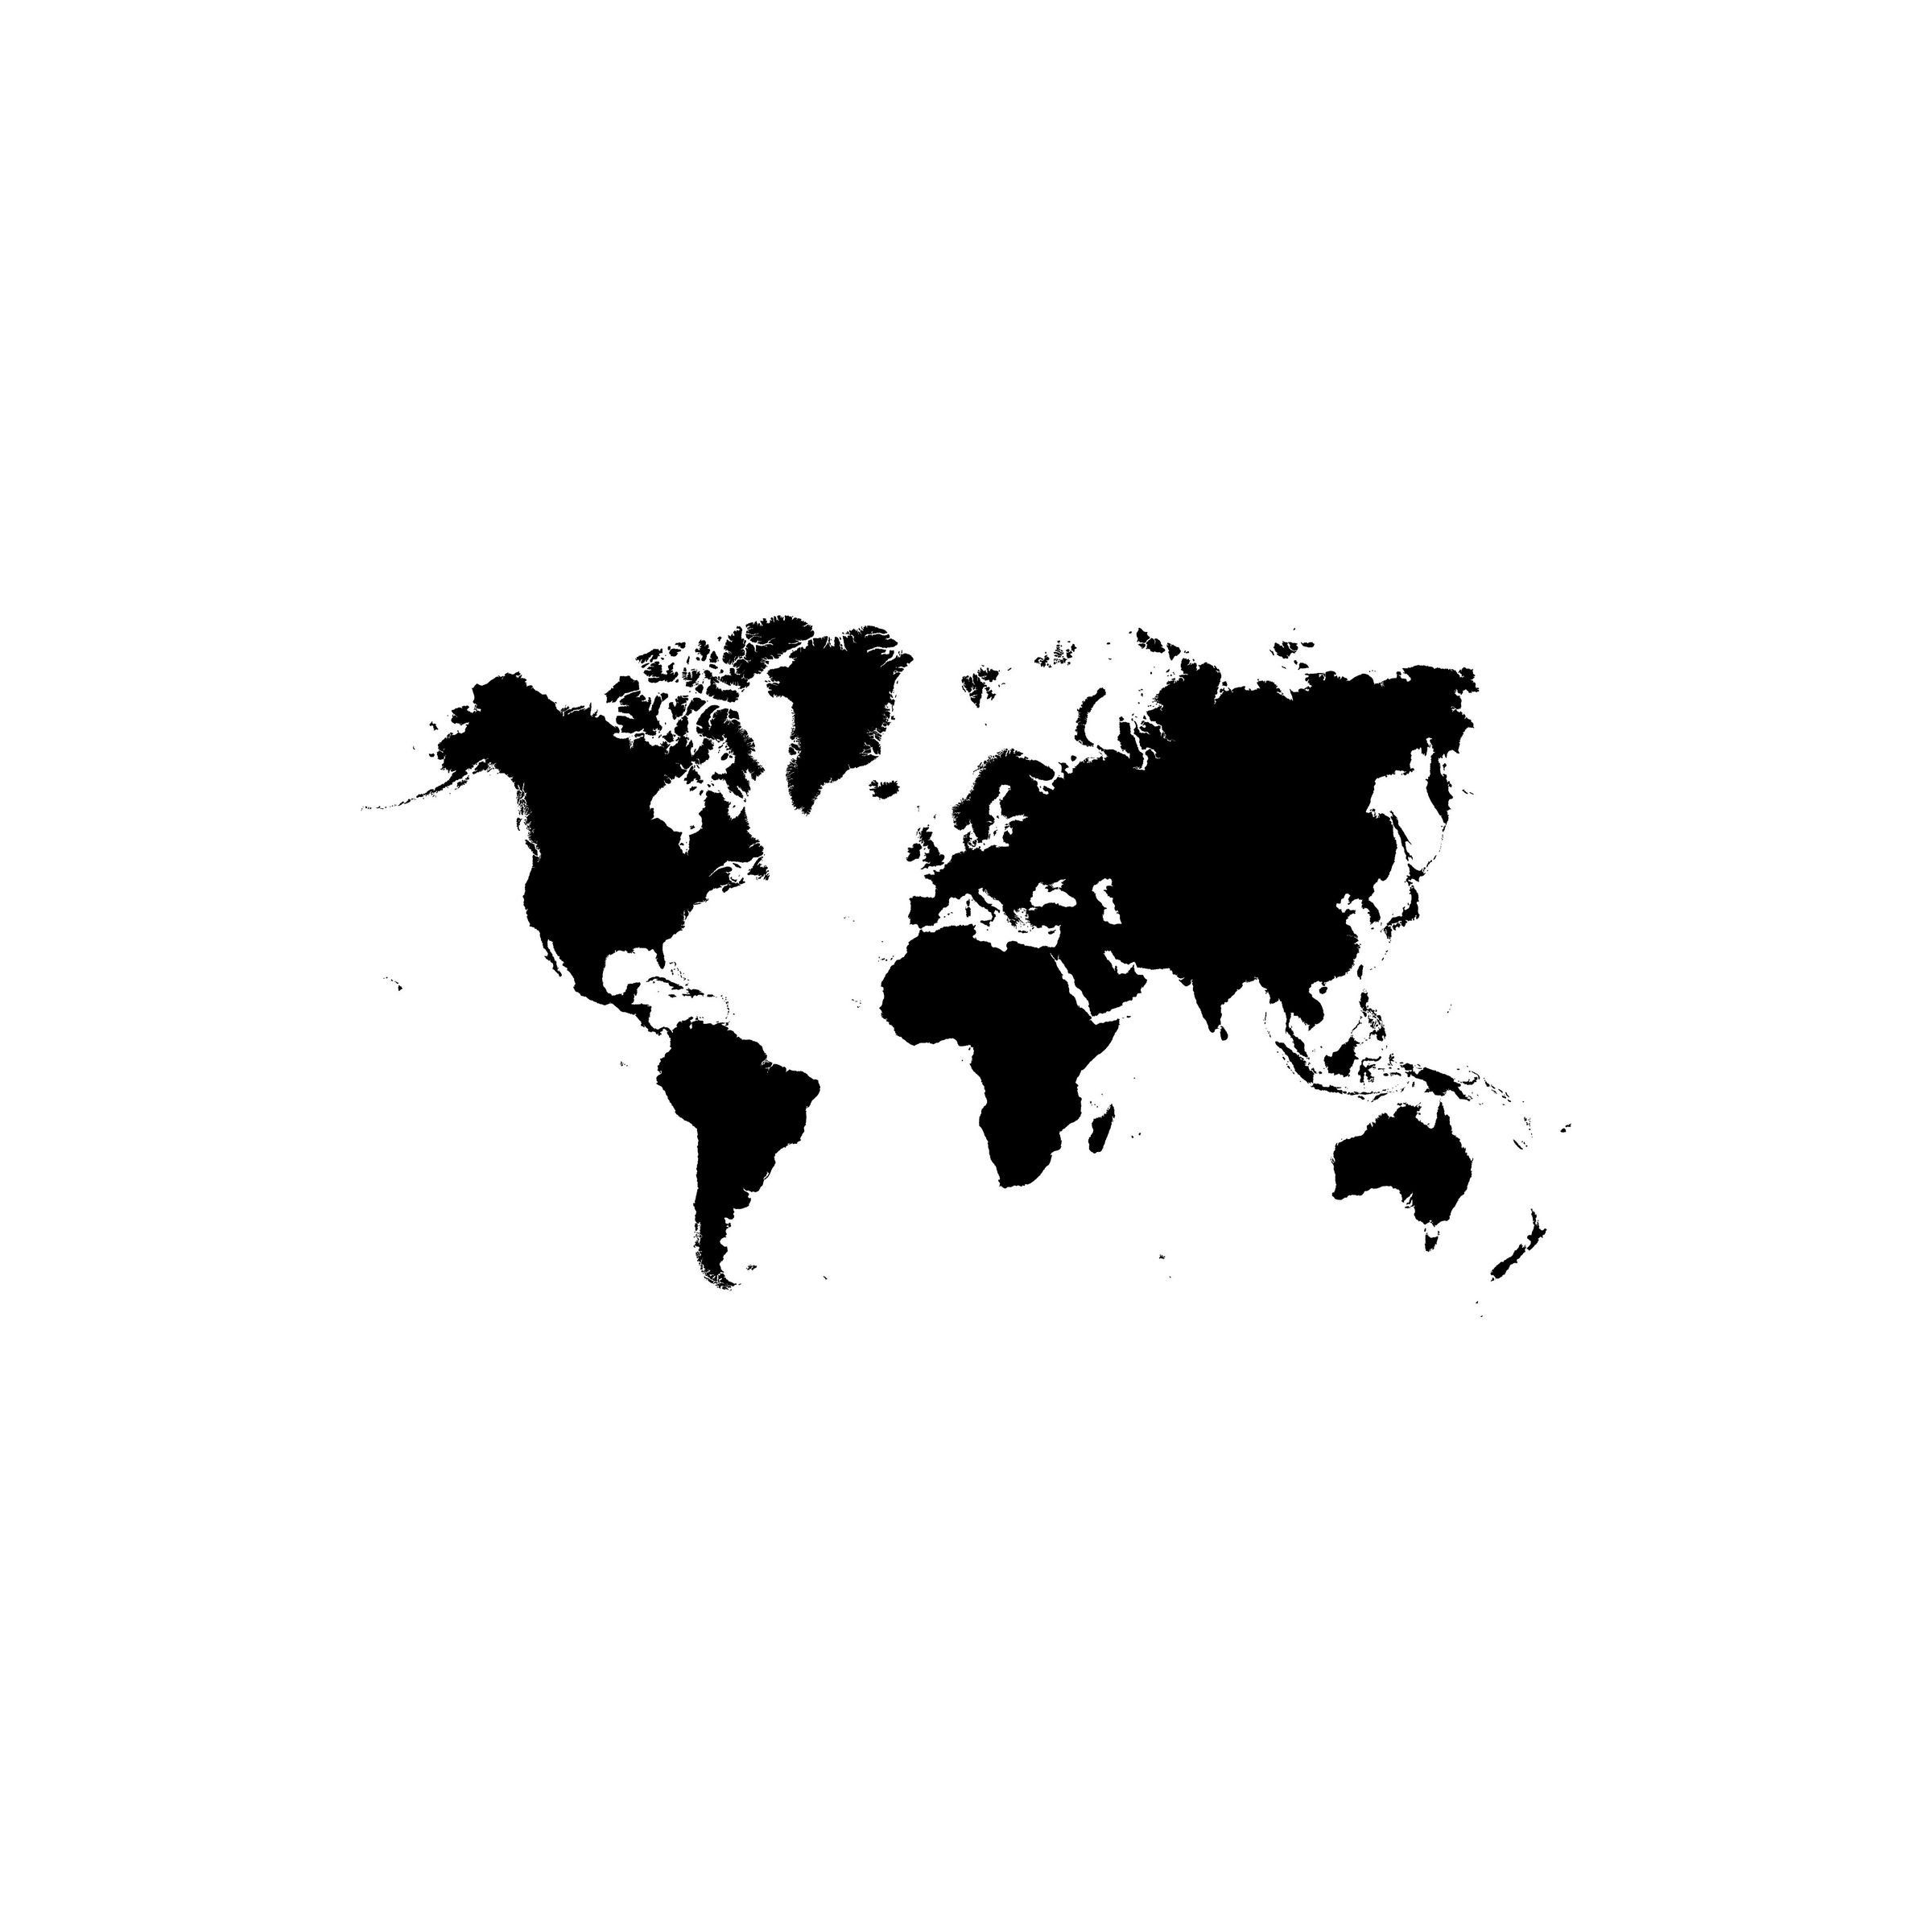 World 1 Map Africa America Asia Atlas Australia Cartography Etsy In 2021 Map Art Print World Map Art Map Canvas Print